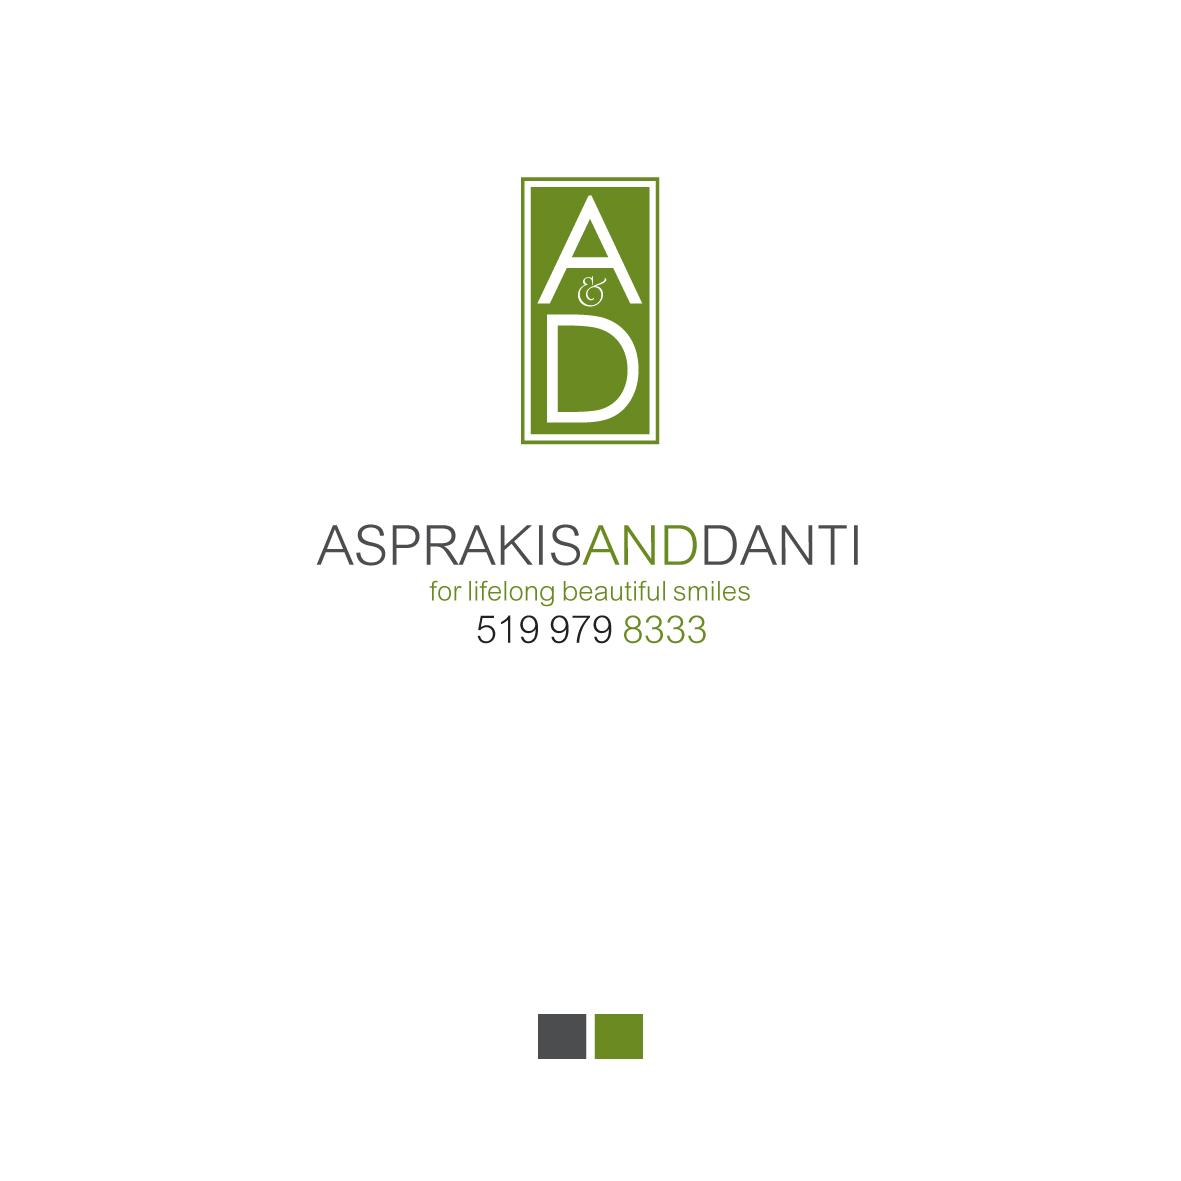 Logo Design by Alexandros Konstantinou - Entry No. 198 in the Logo Design Contest Unique Logo Design Wanted for Asprakis and Danti.